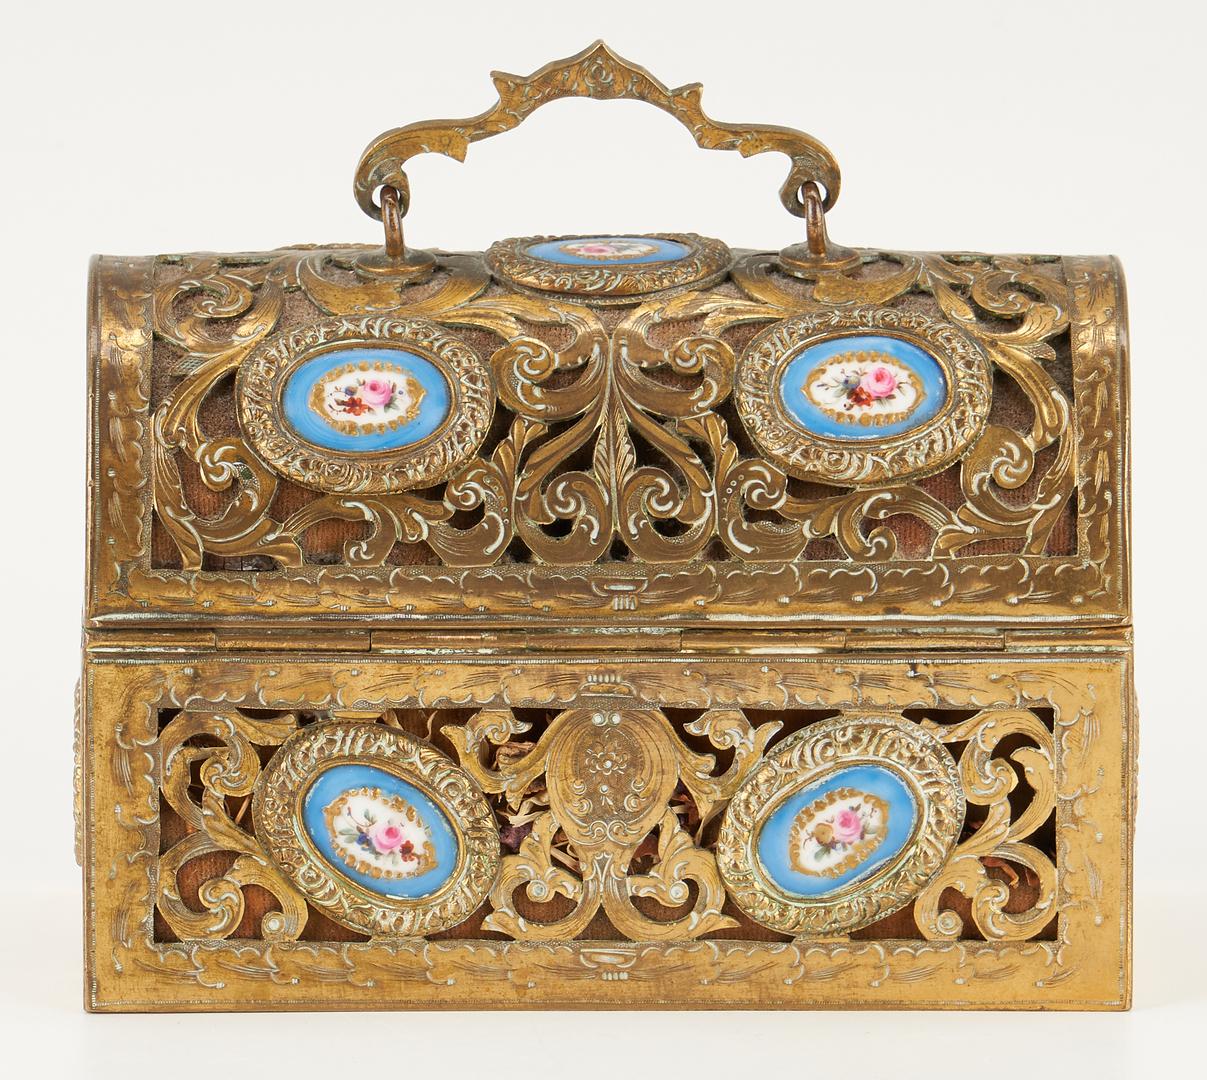 Lot 251: 3 European Decorative Items: Dresser Box, Miniature Portrait and Urn